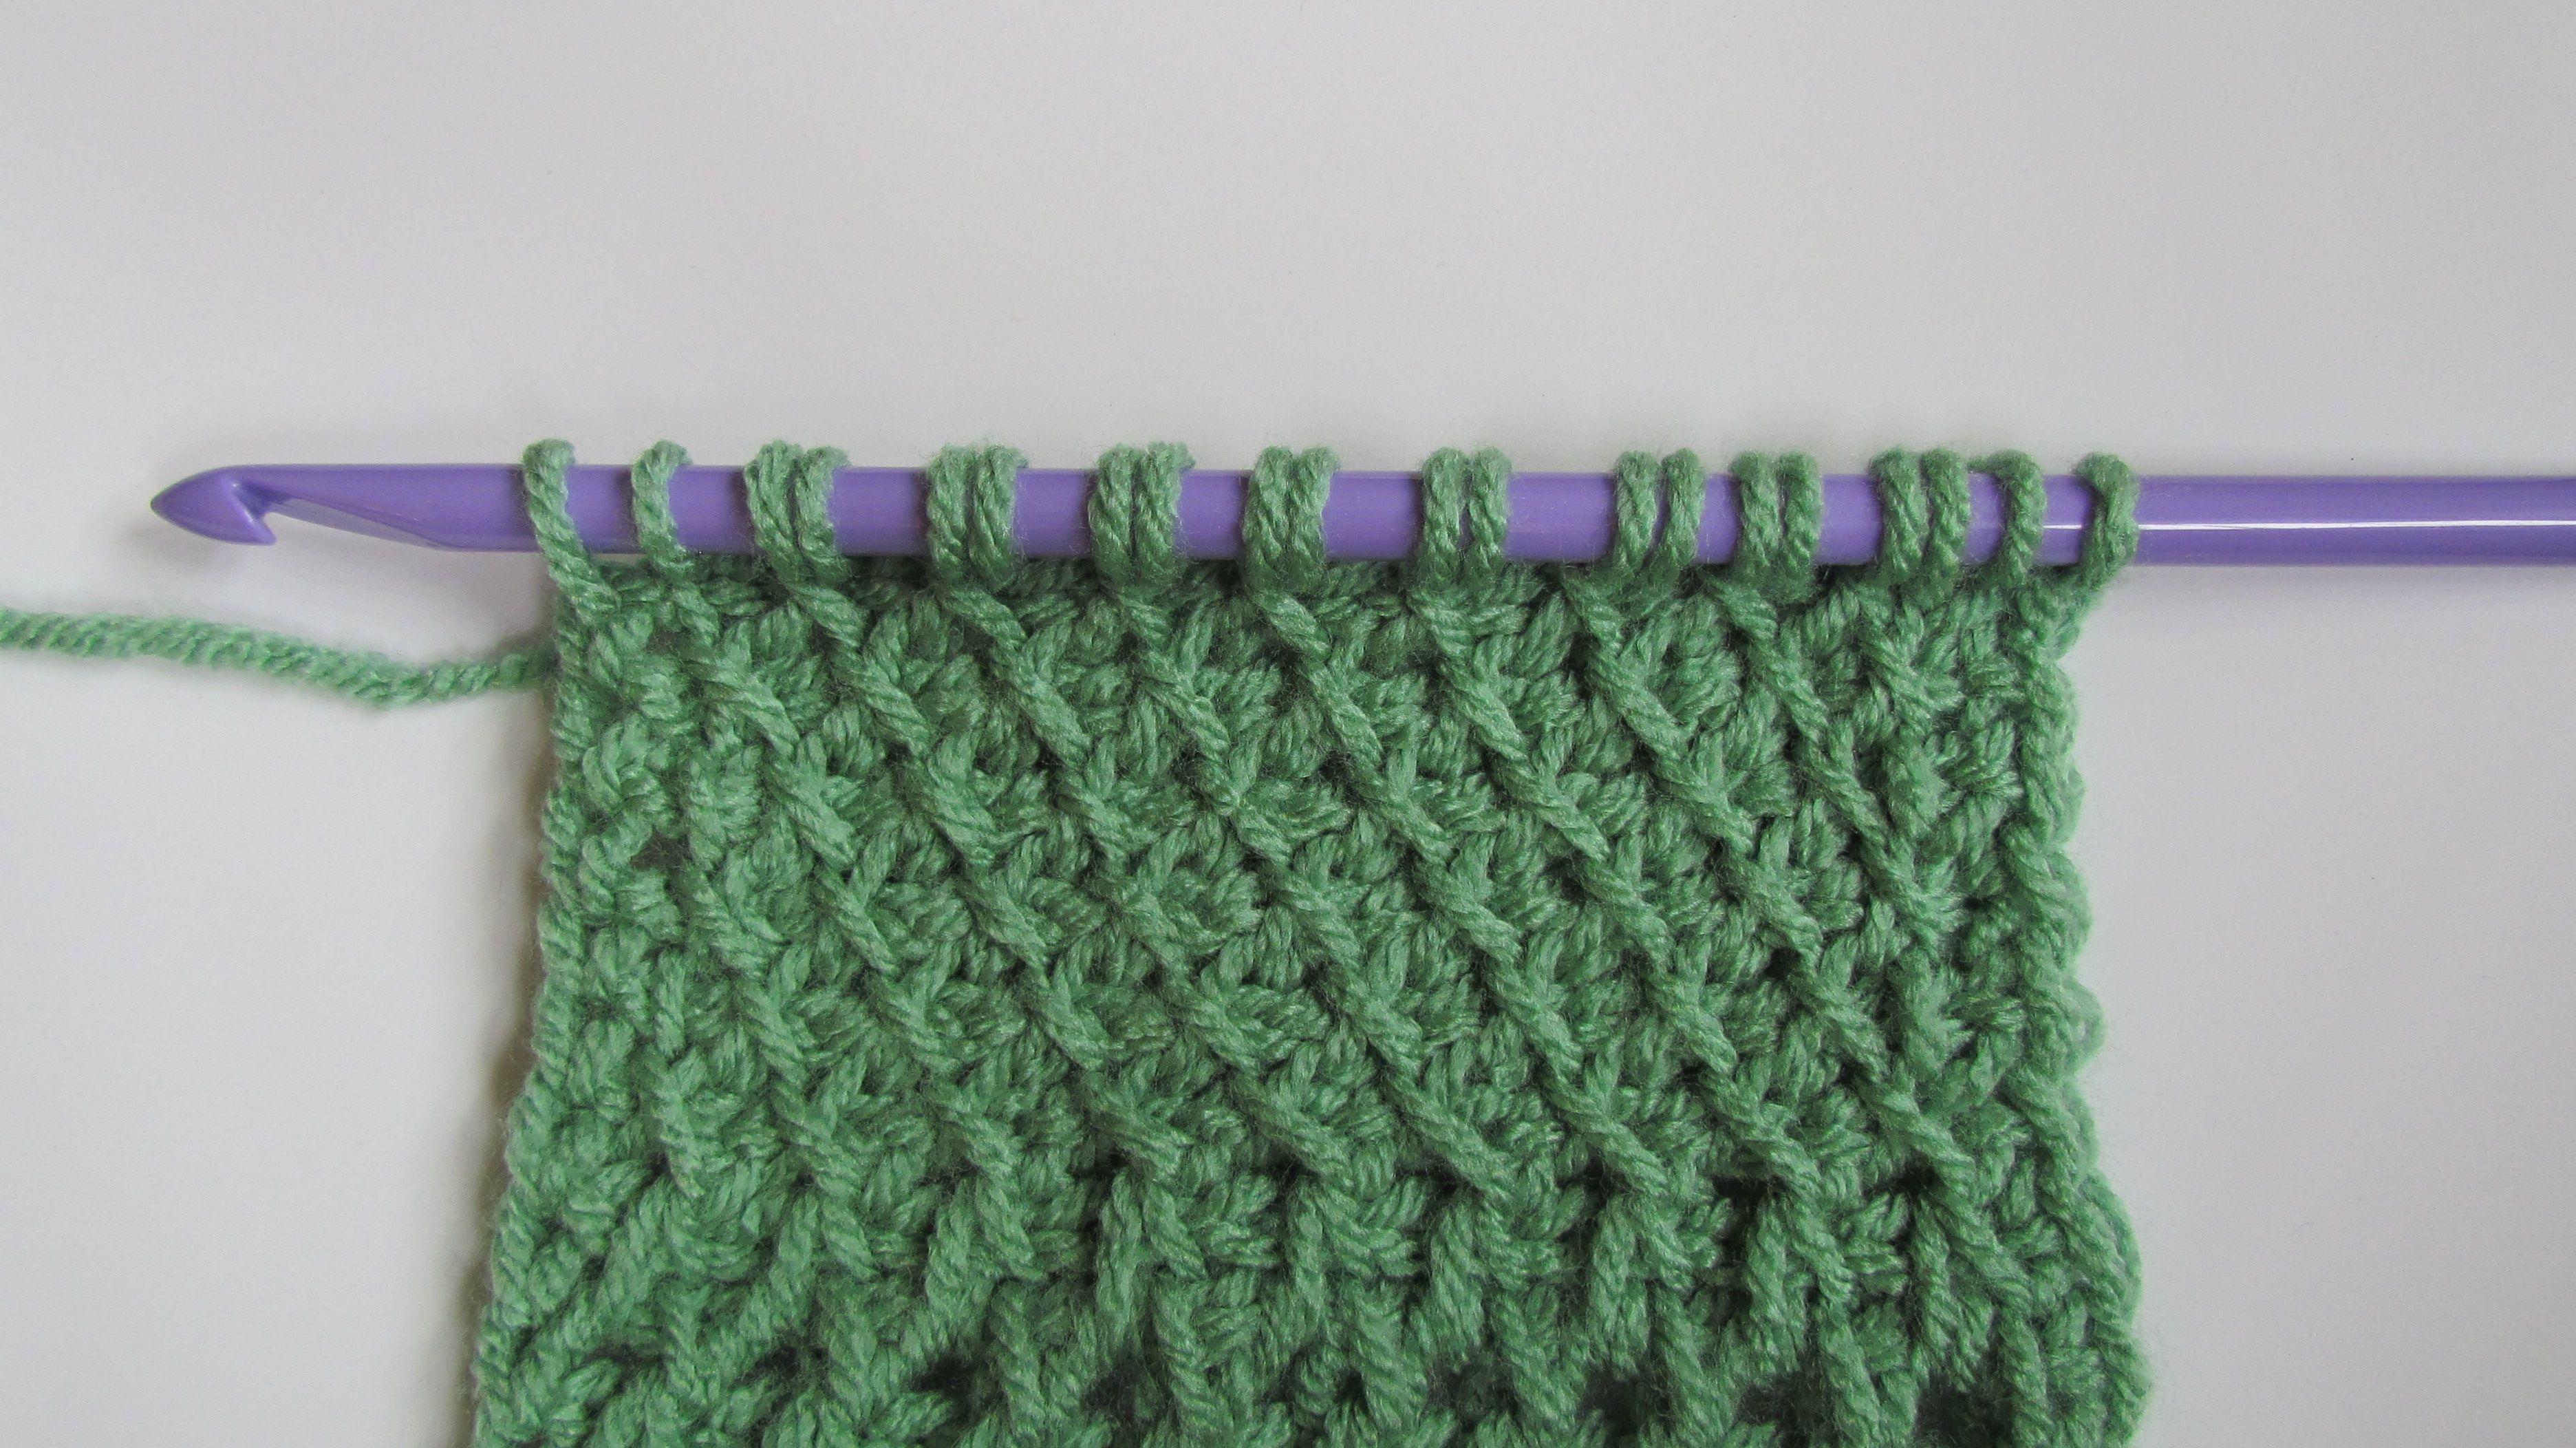 Tunisian slanted fabric stitch tunisian crochet stitches tunisian slanted fabric stitch fabric patternscrochet bankloansurffo Images